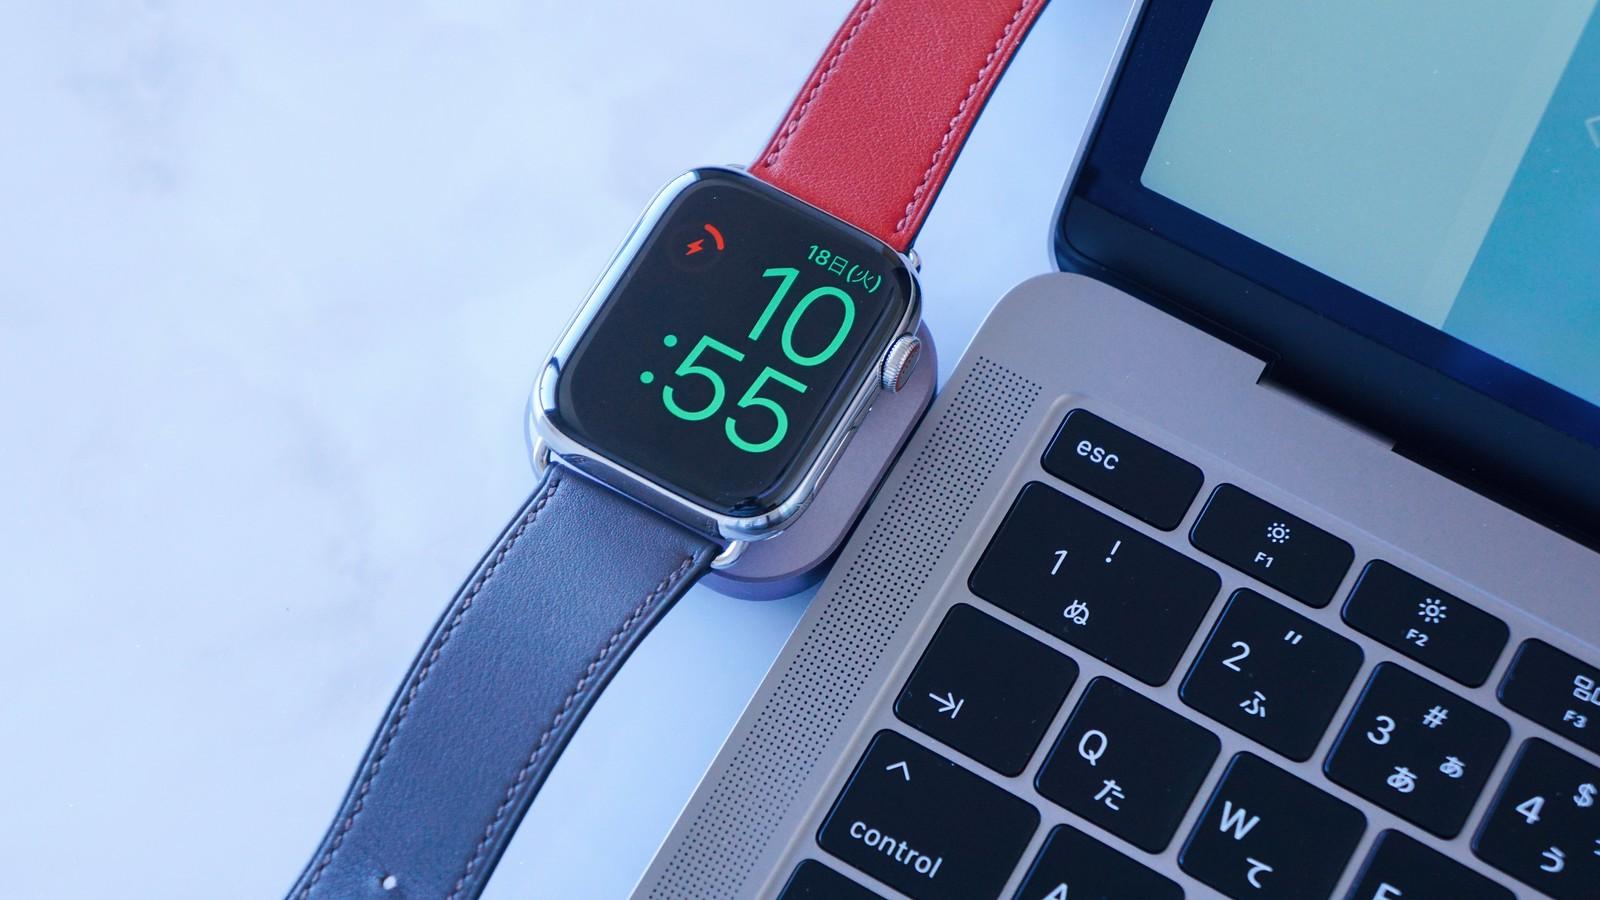 Apple Watchの充電中は時計としても利用可能